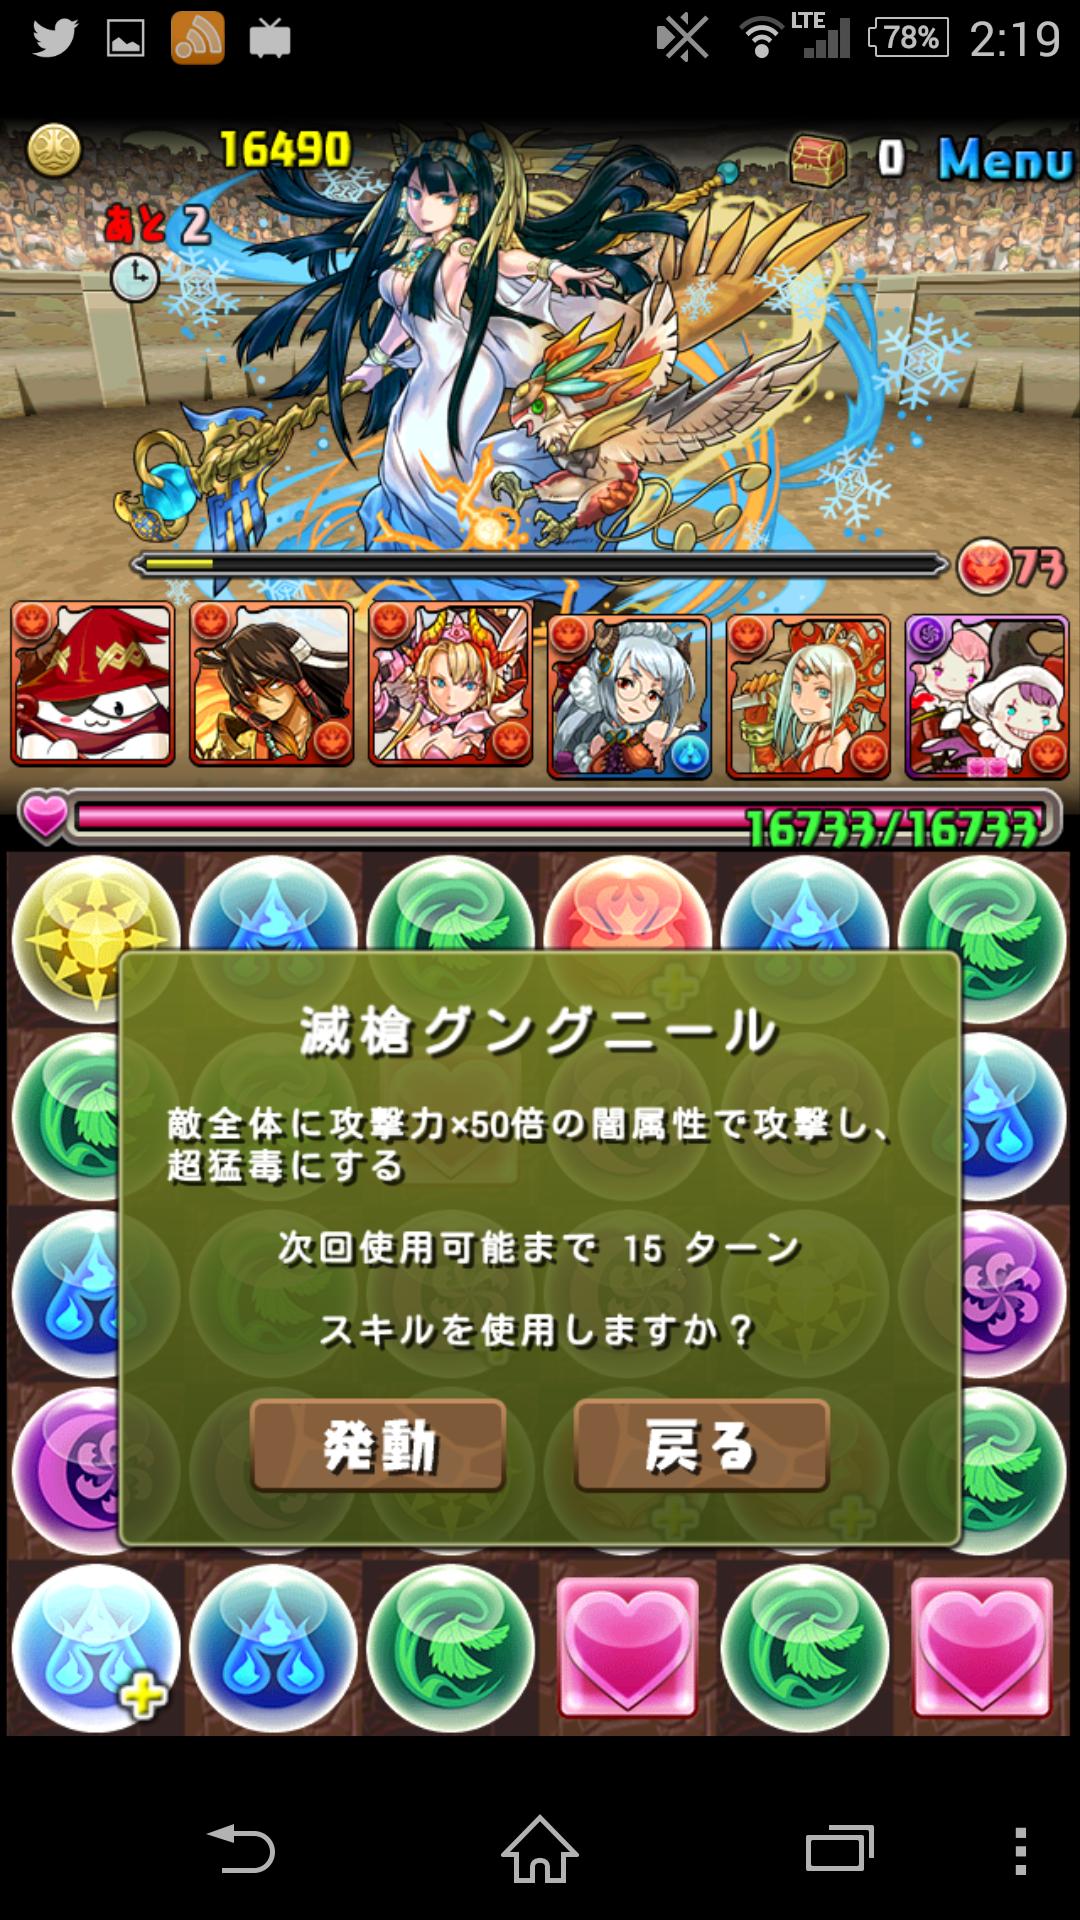 Screenshot_2015-03-12-02-20-00.png